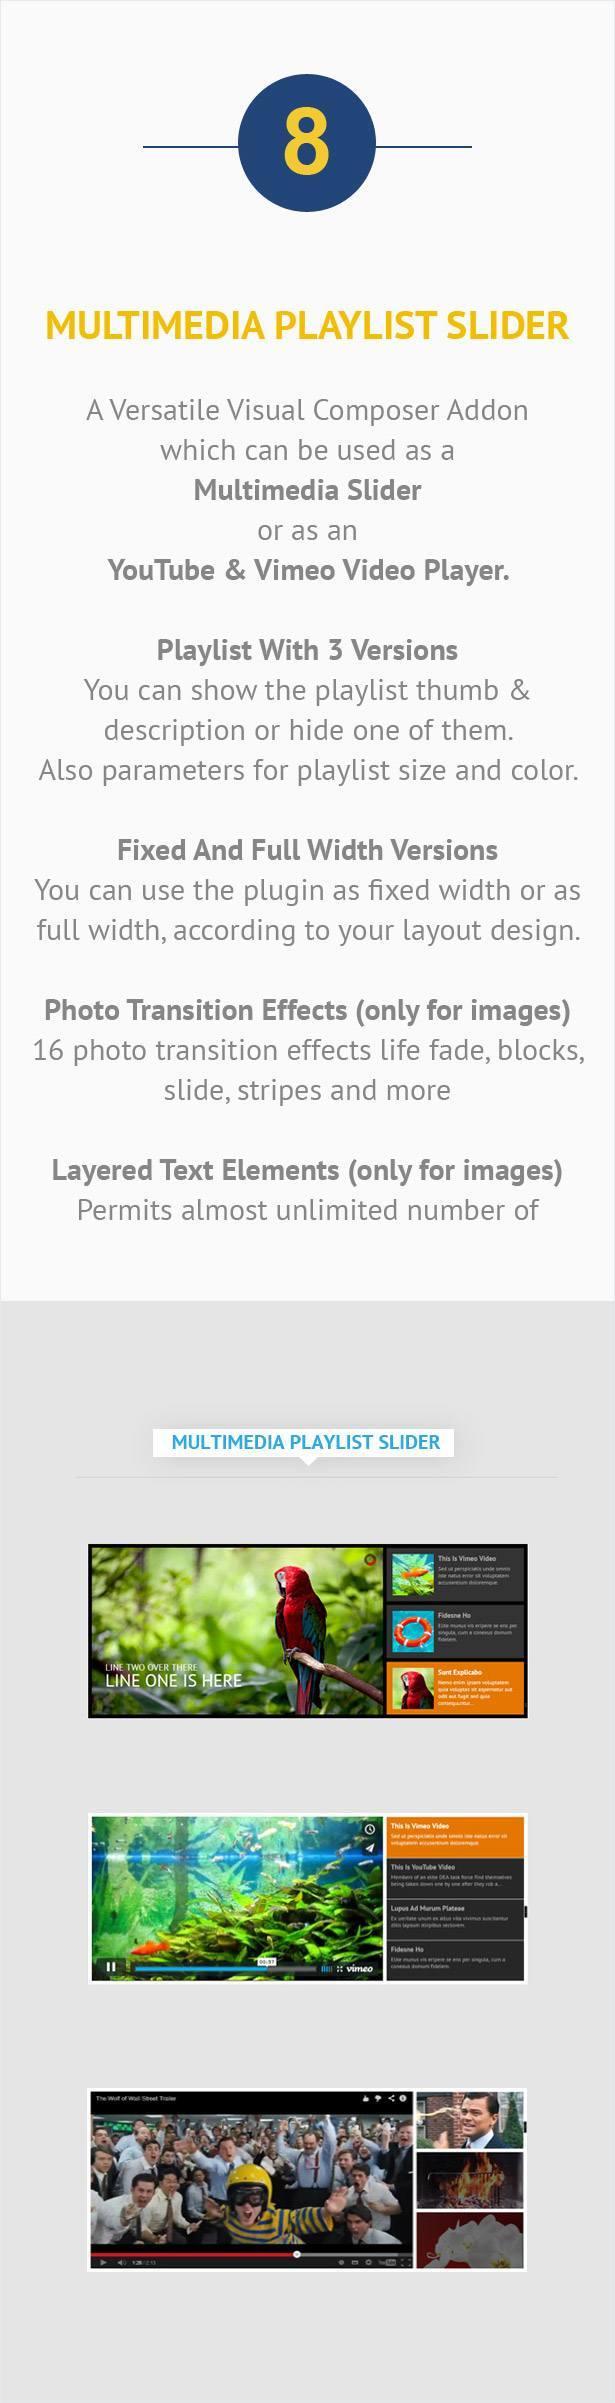 Visual Composer Addon – Multimedia Playlist Slider